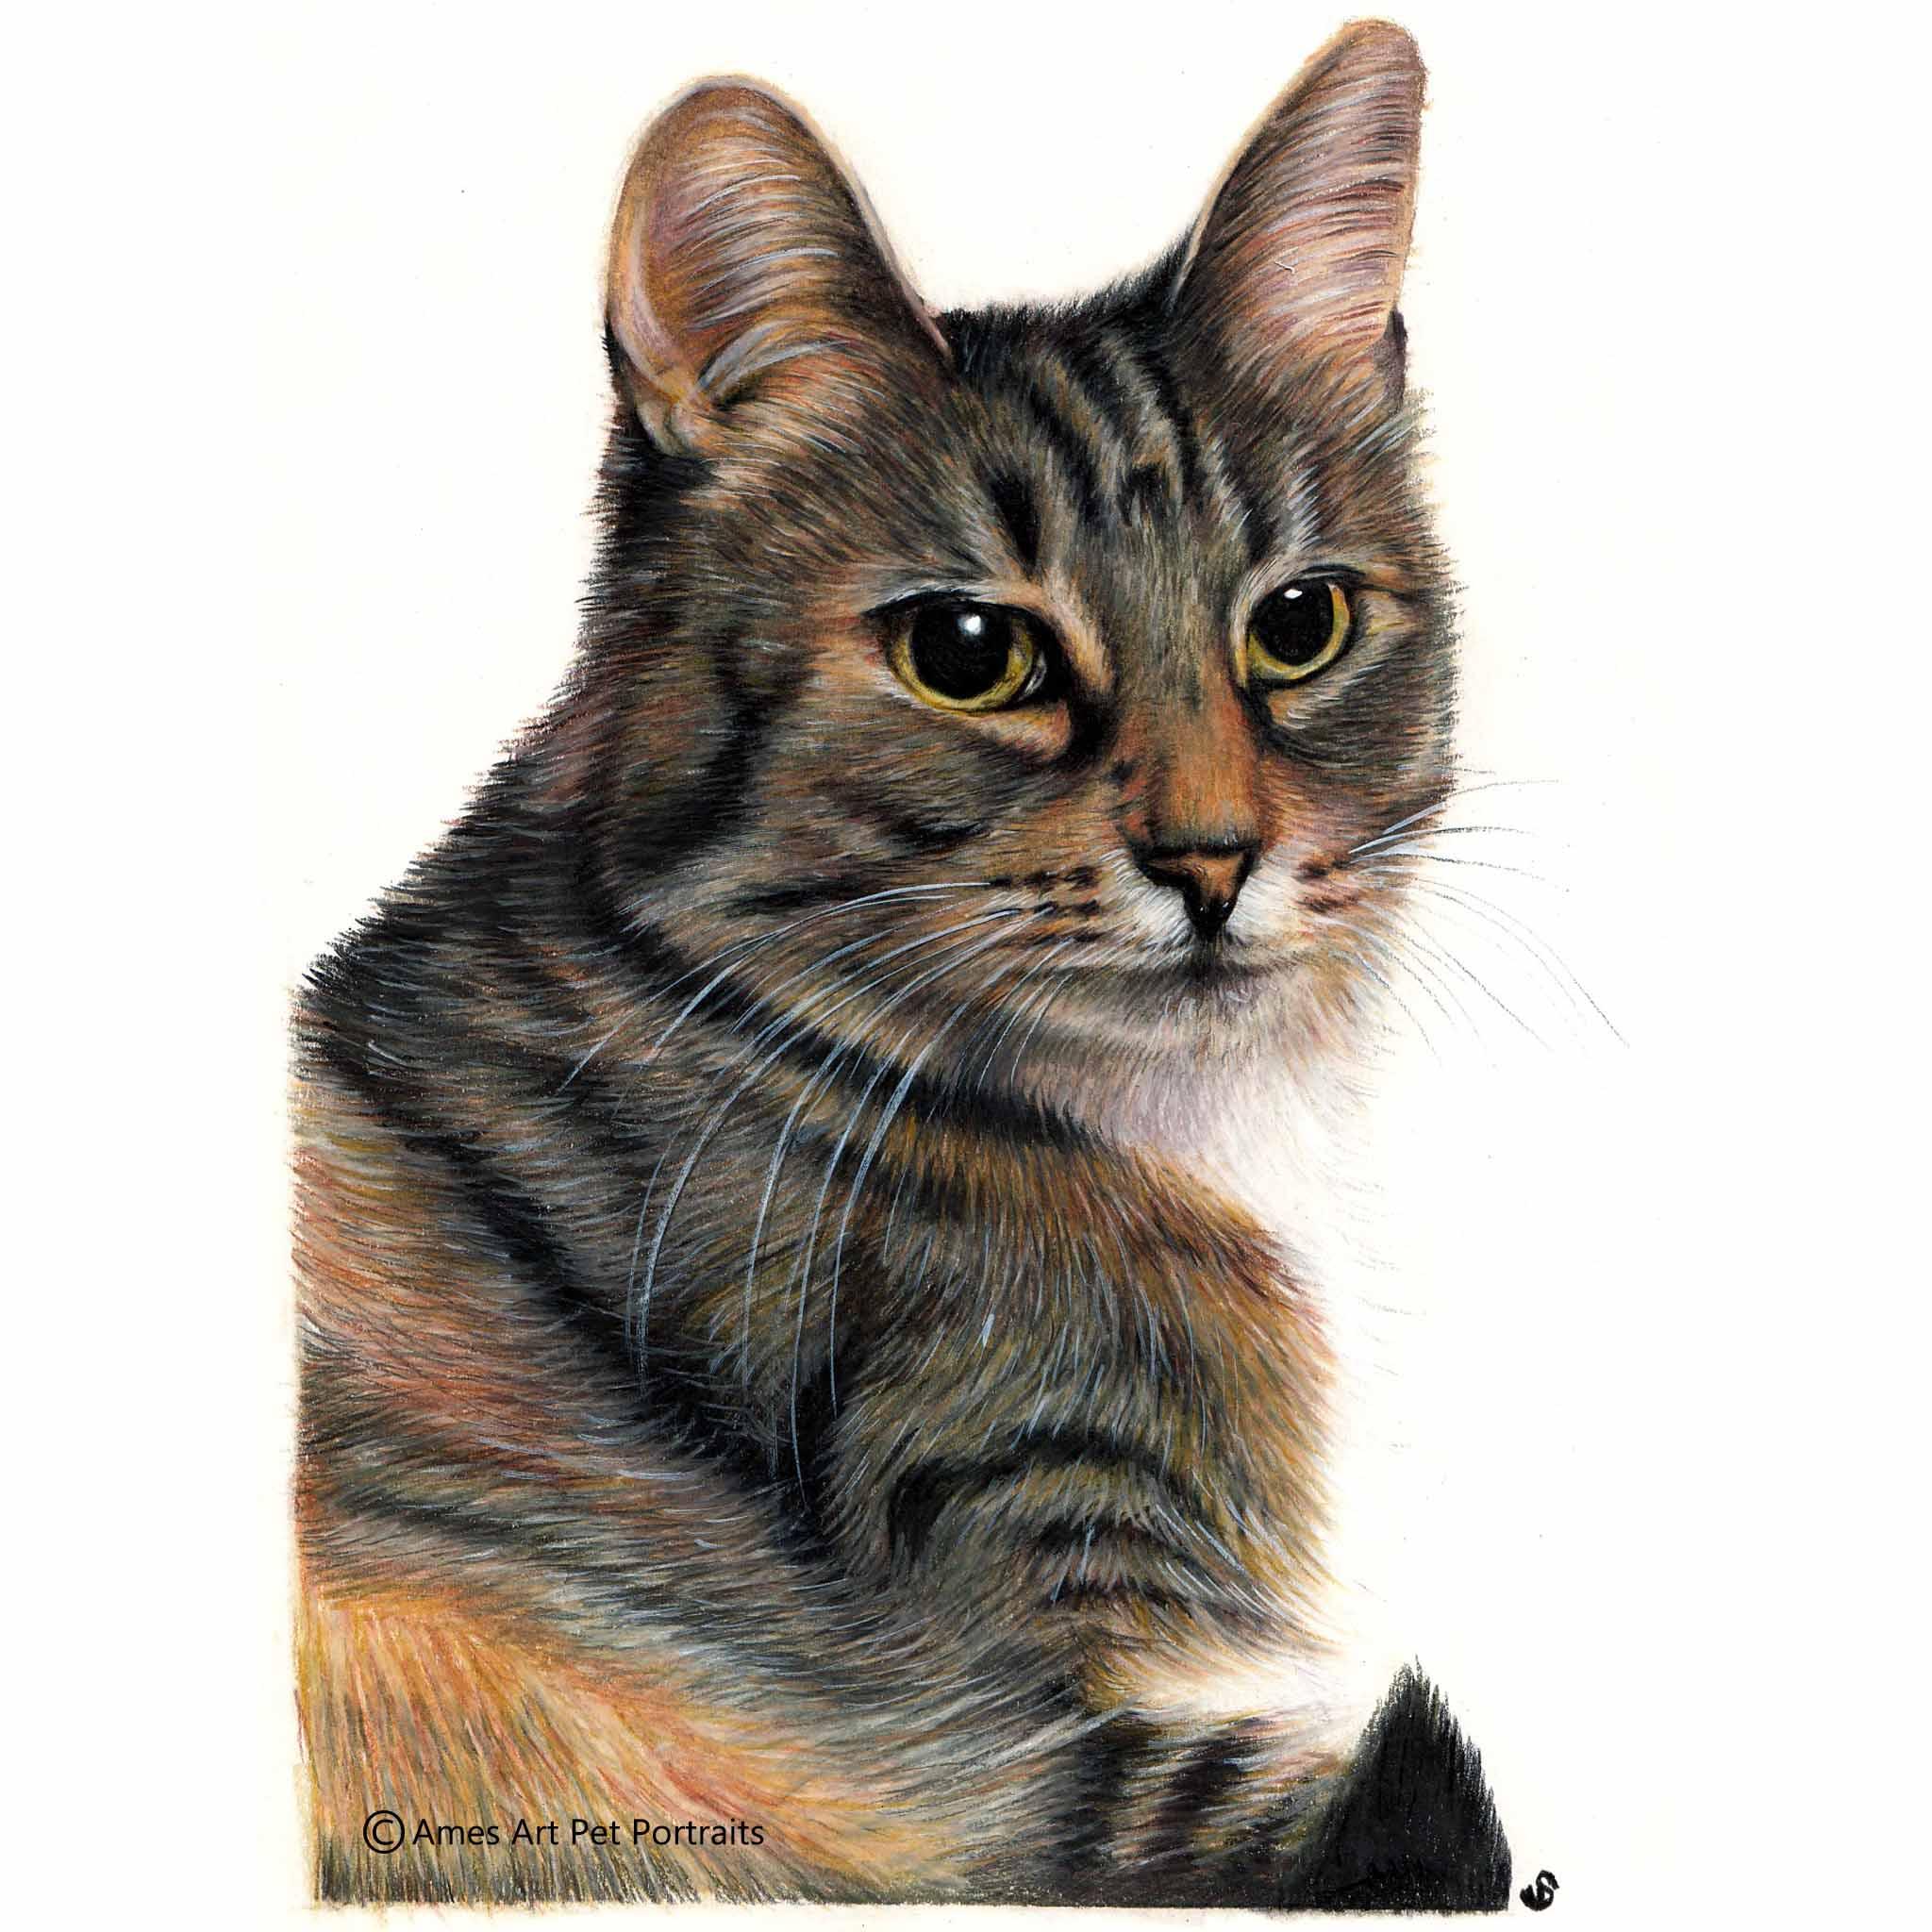 'Stray' - USA, 8.3 x 11.7 inches, 2017, Color Pencil Cat Portrait